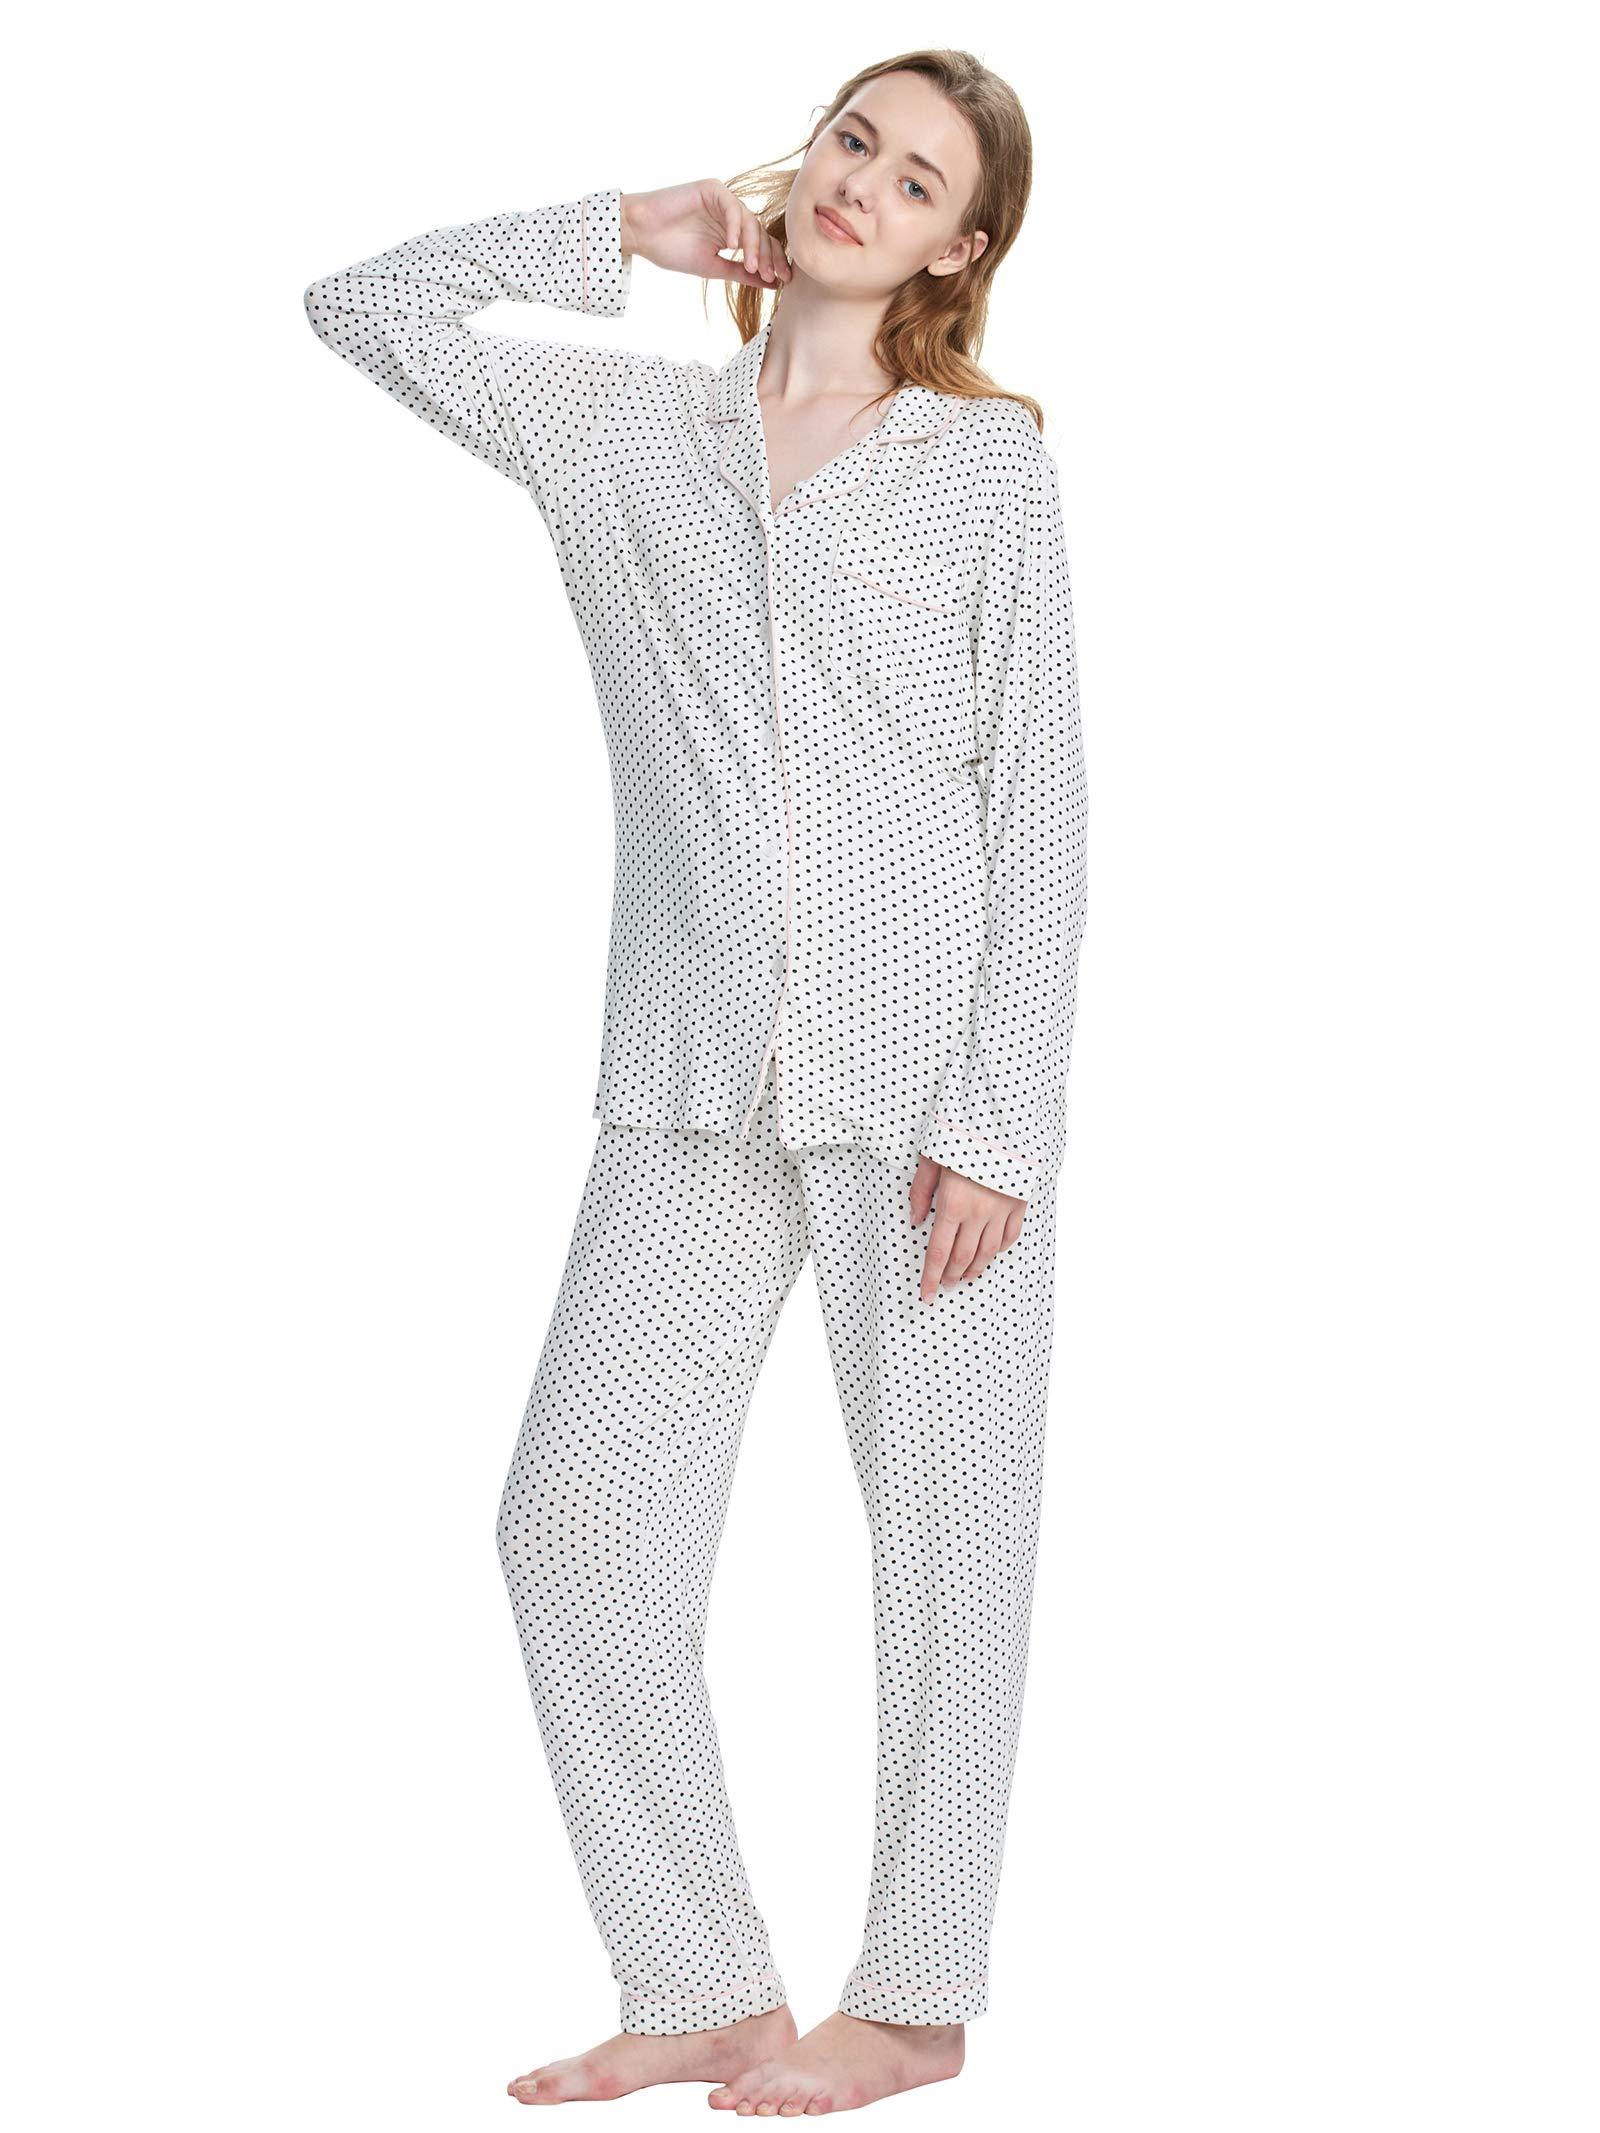 SIORO Womens Pajamas Long Sleeve Summer Pajama Set Soft Cotton Sleepwear 2 Piece Lightweight Loungewear Soft Sleepshirt with Pants White M